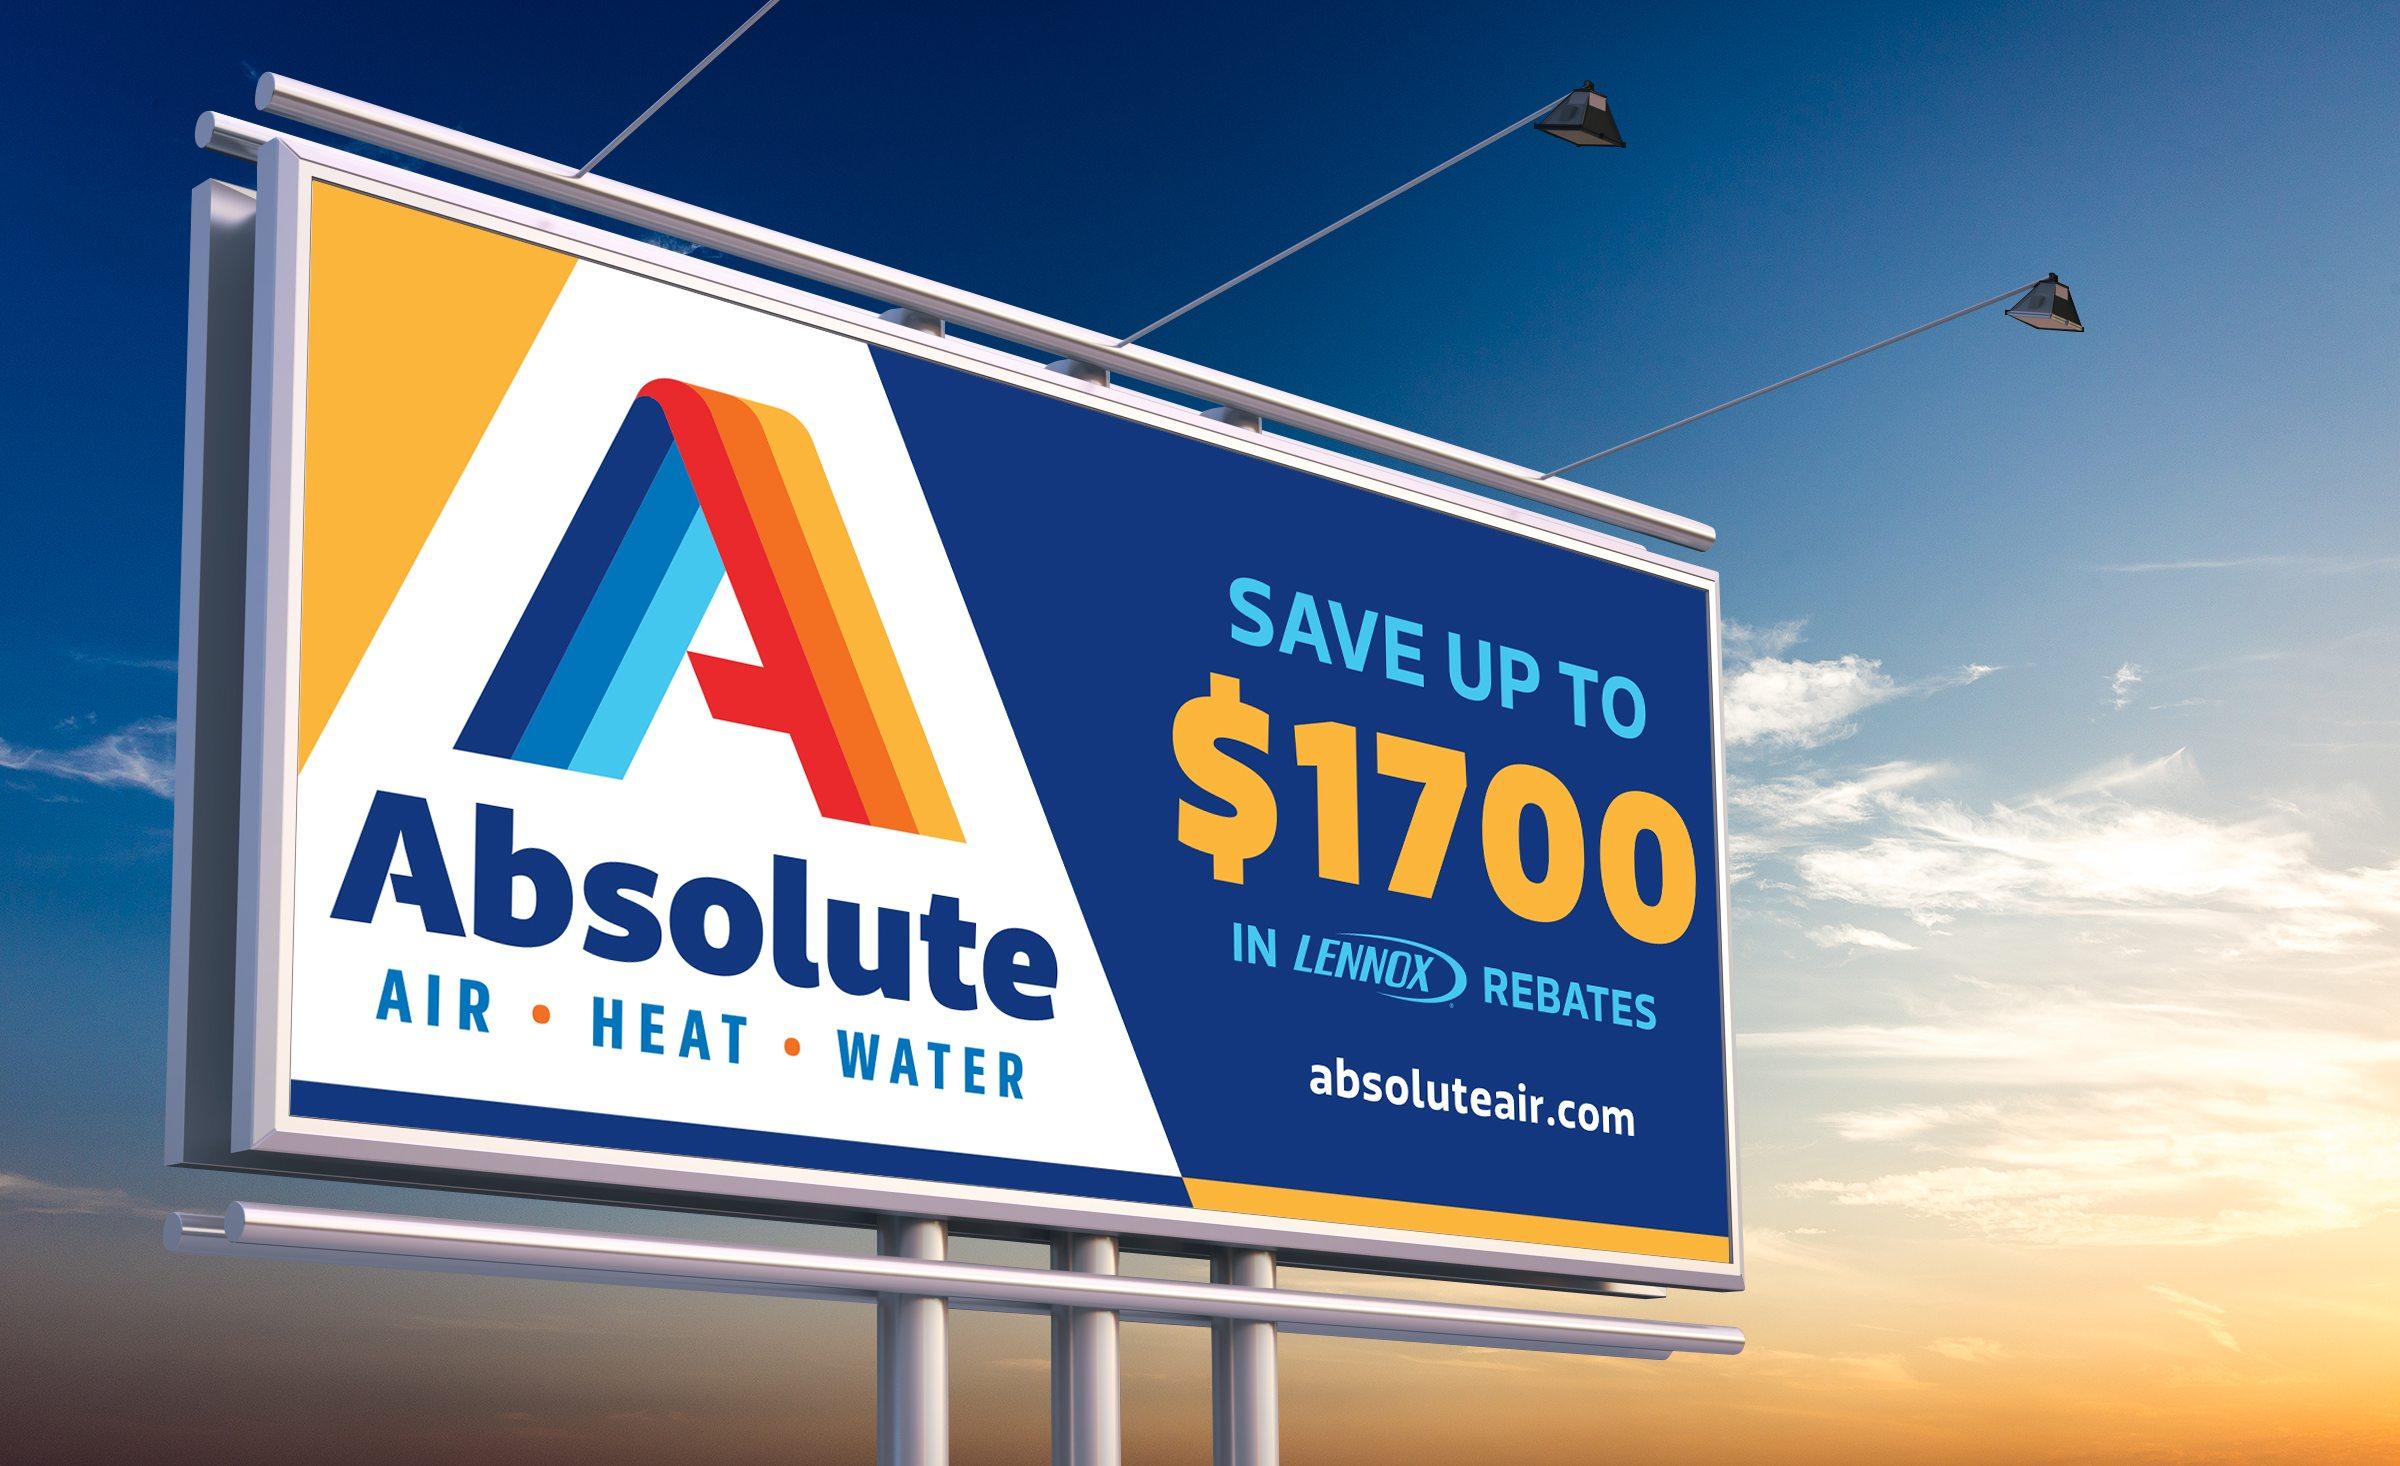 Absolute Air, Heat & Water